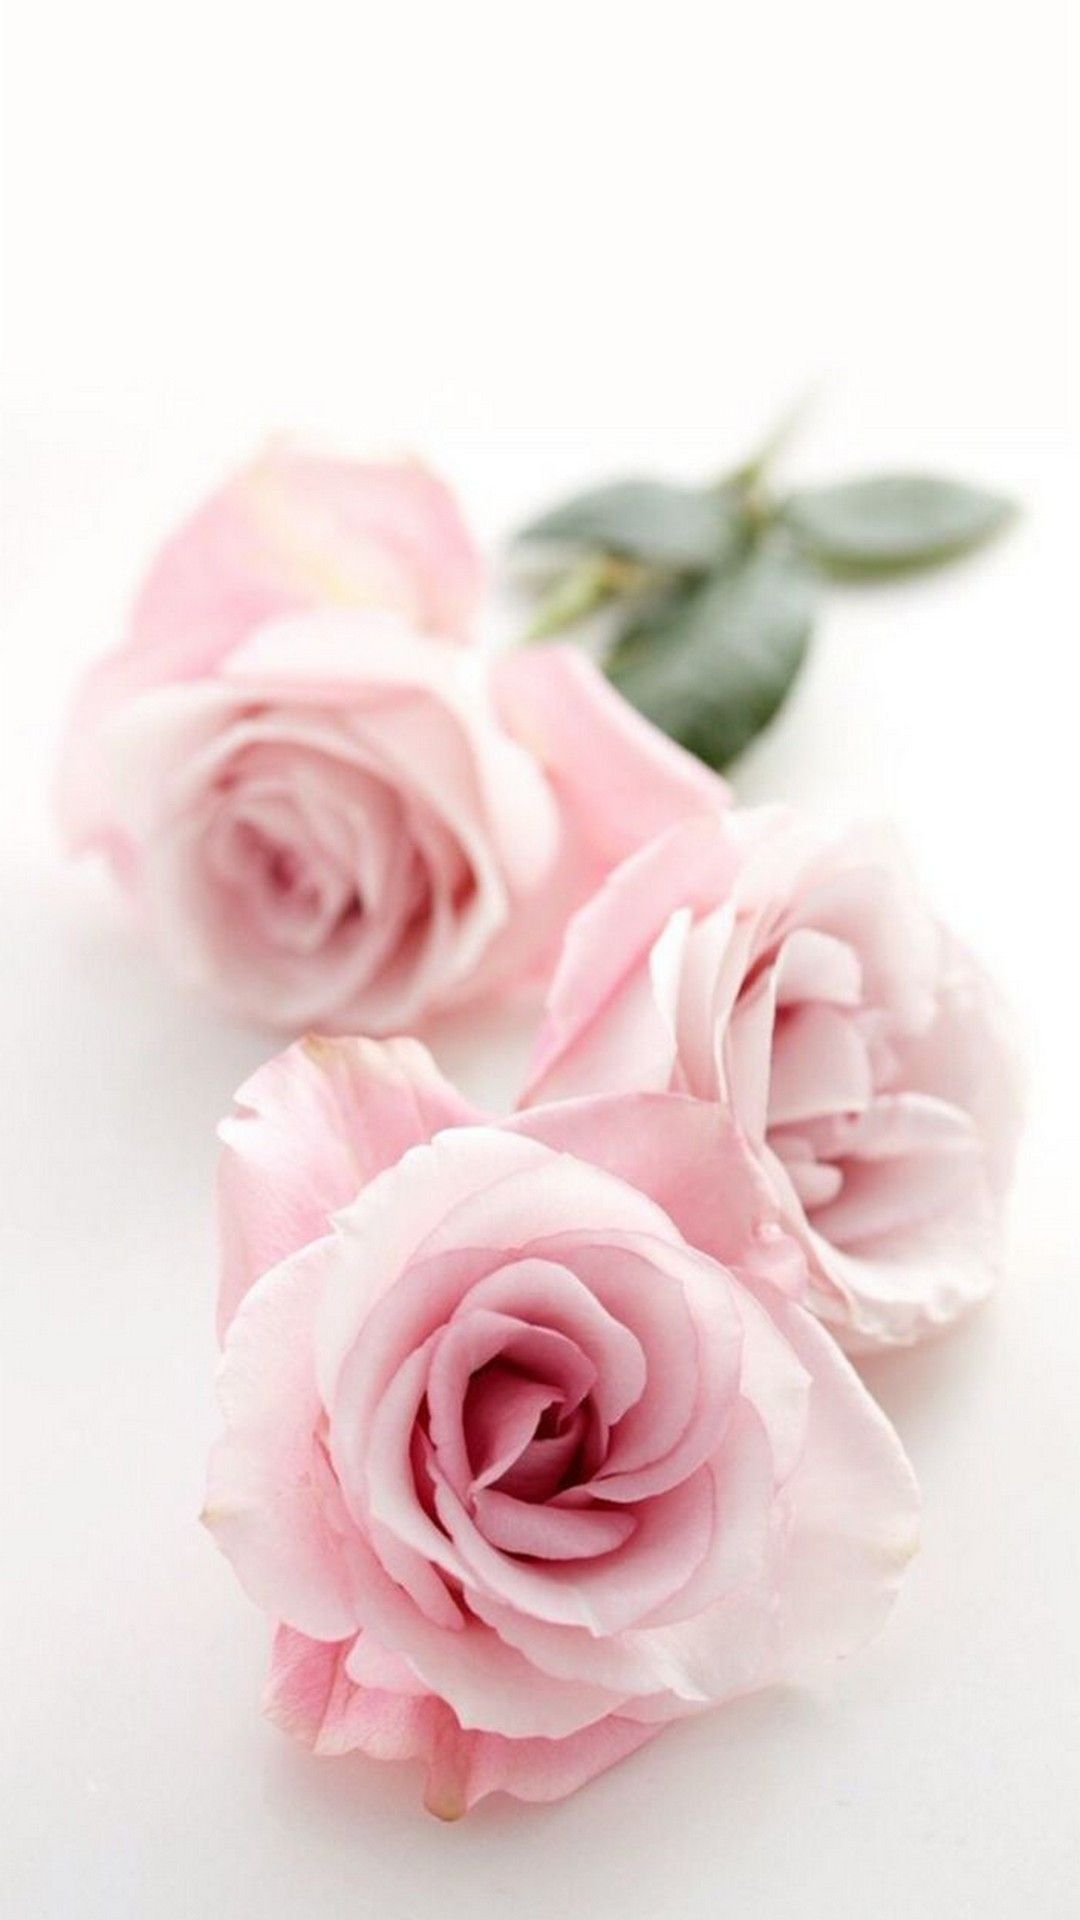 Cute Girly Flower Wallpapers Top Free Cute Girly Flower